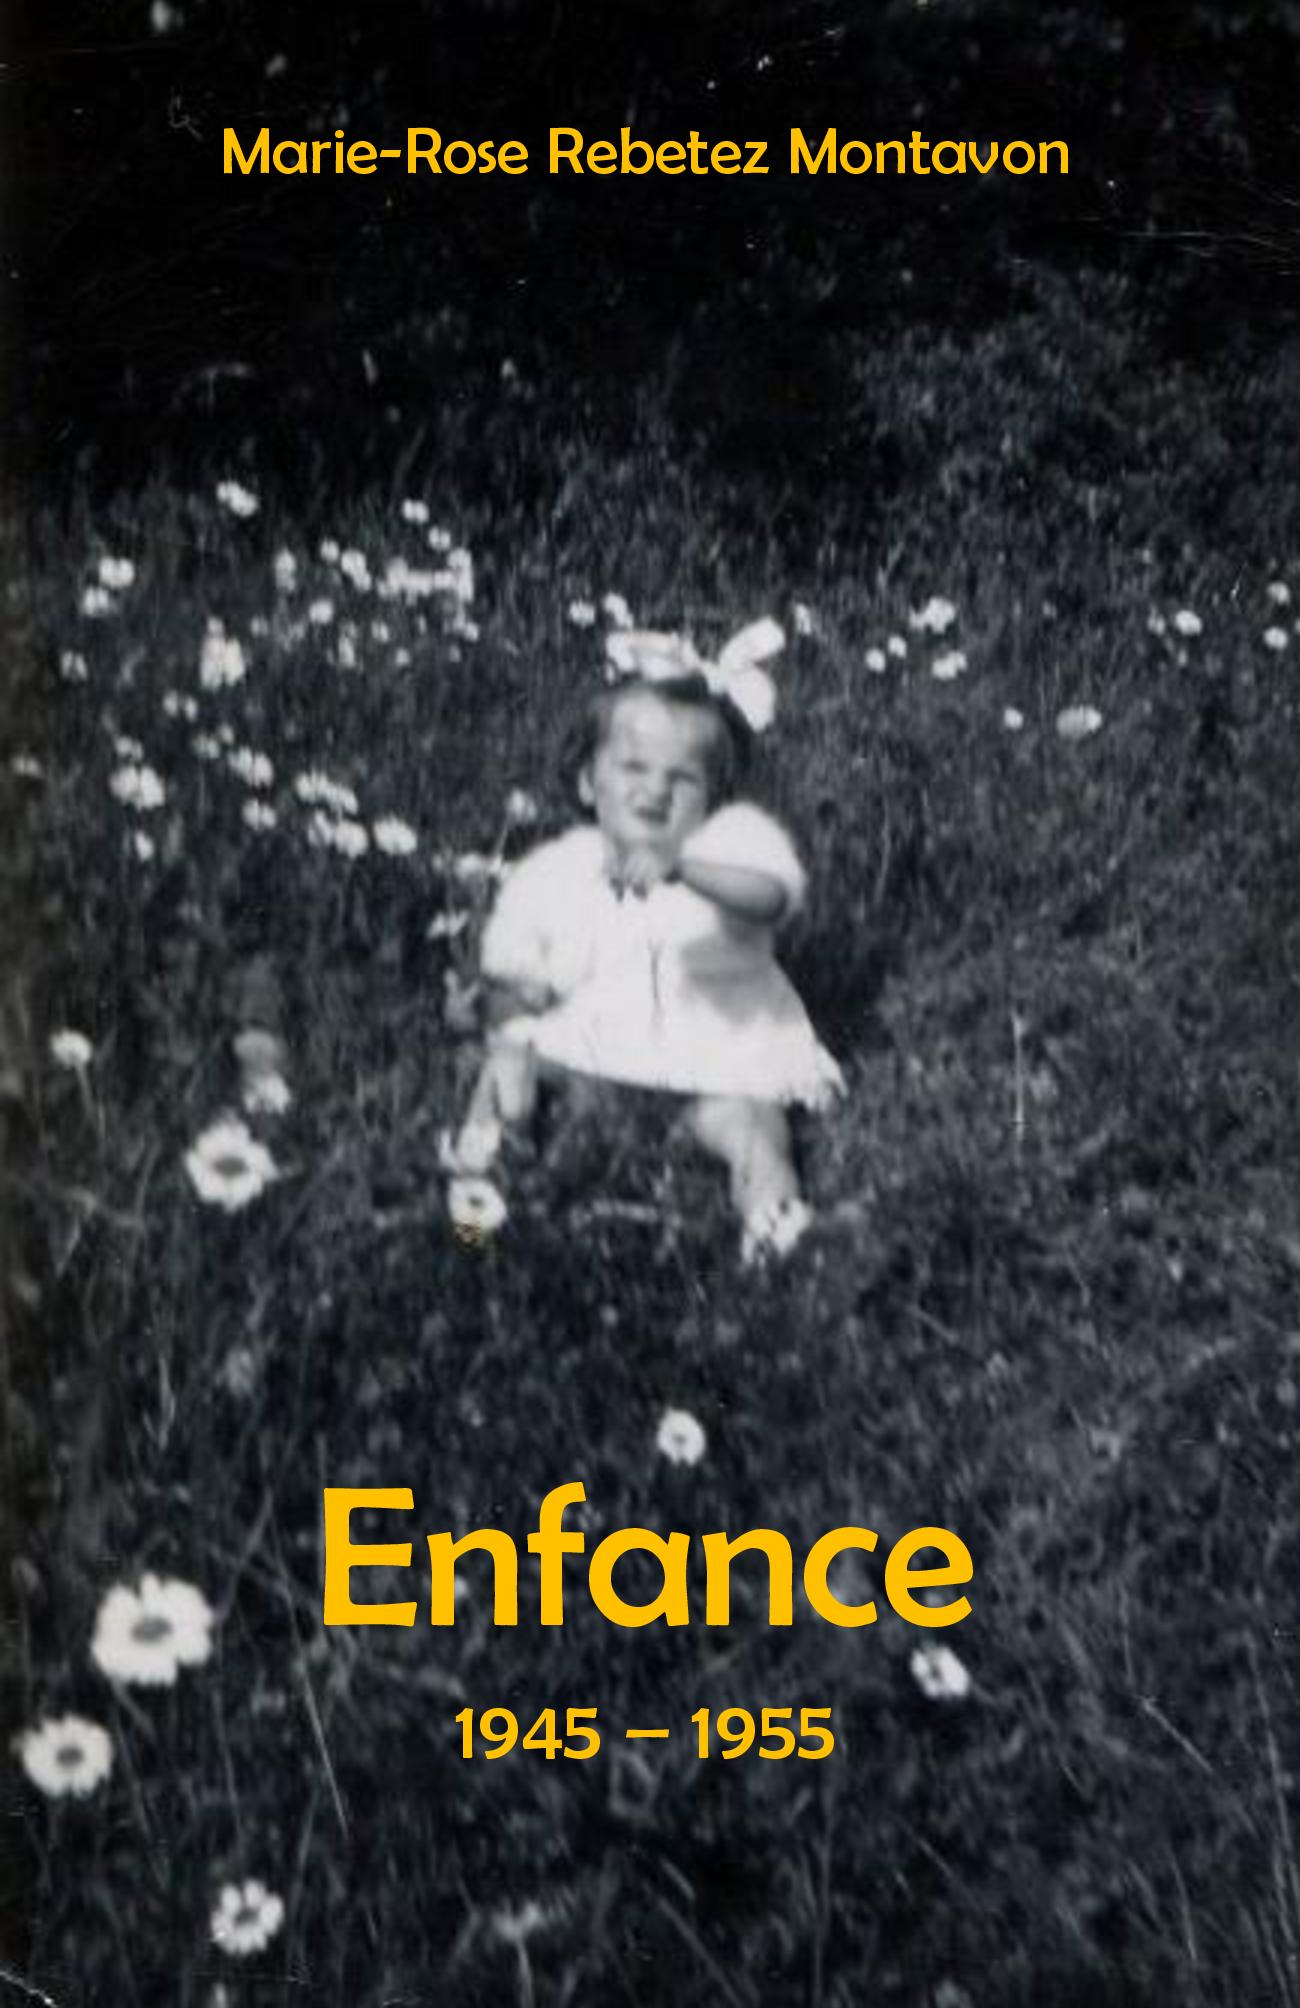 Enfance, 1945 - 1955